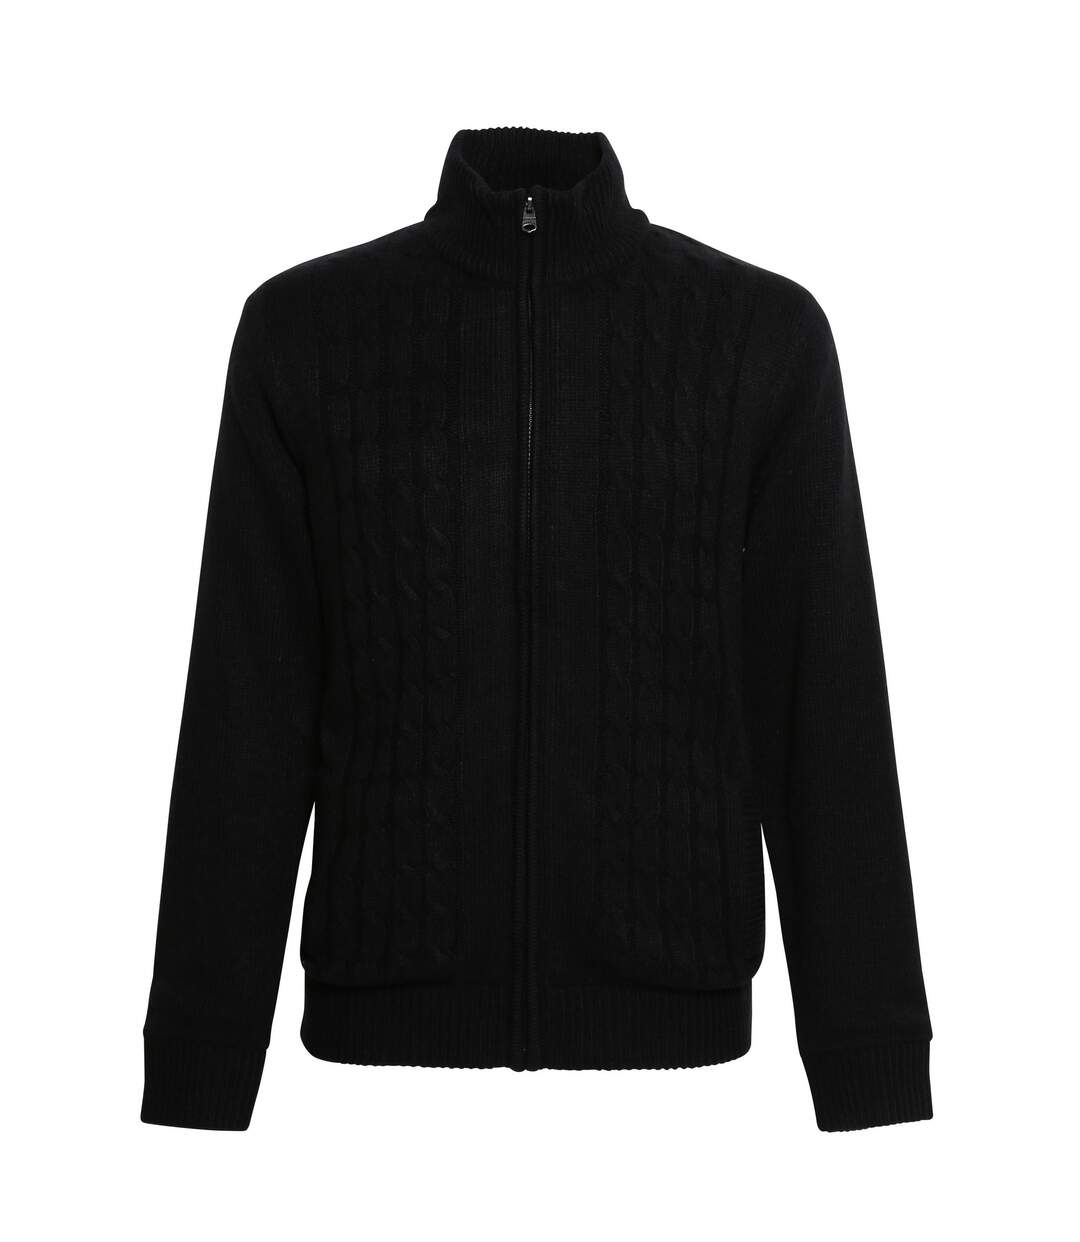 Affordable Fashion Mens Bedros Cable Knit Jacket (Black) - UTRW5275